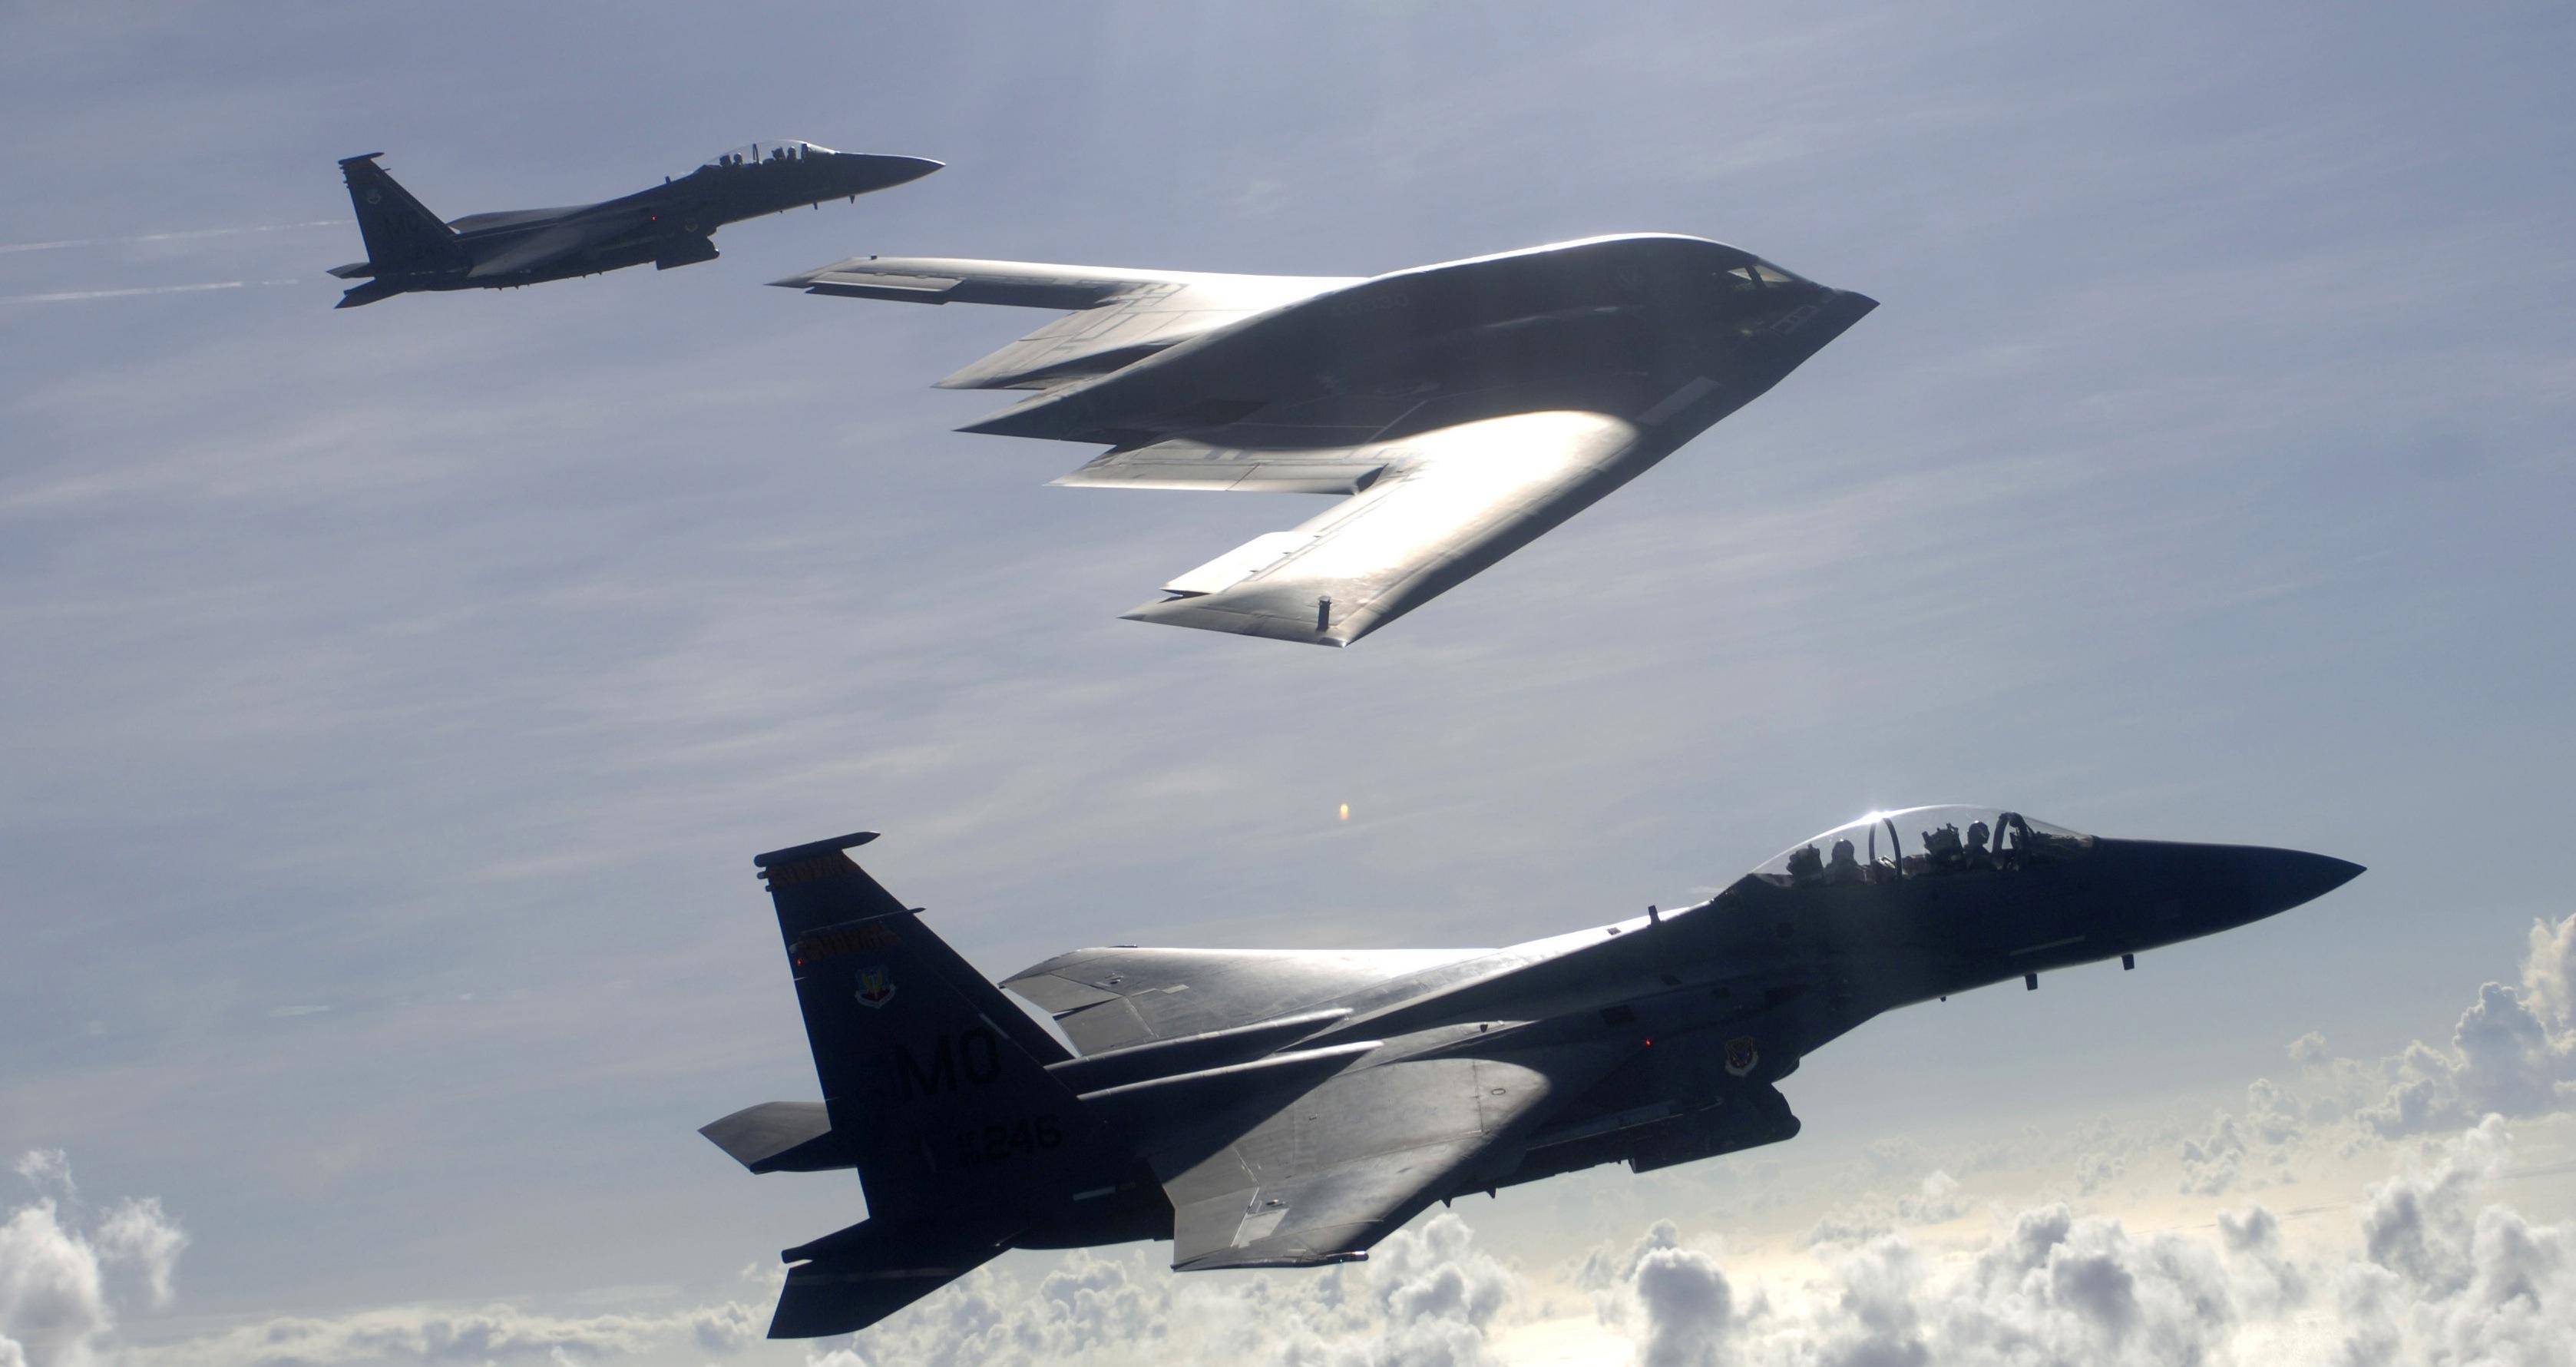 air force afa bomber b21 fighter f35 legacy fleet retirement. Black Bedroom Furniture Sets. Home Design Ideas